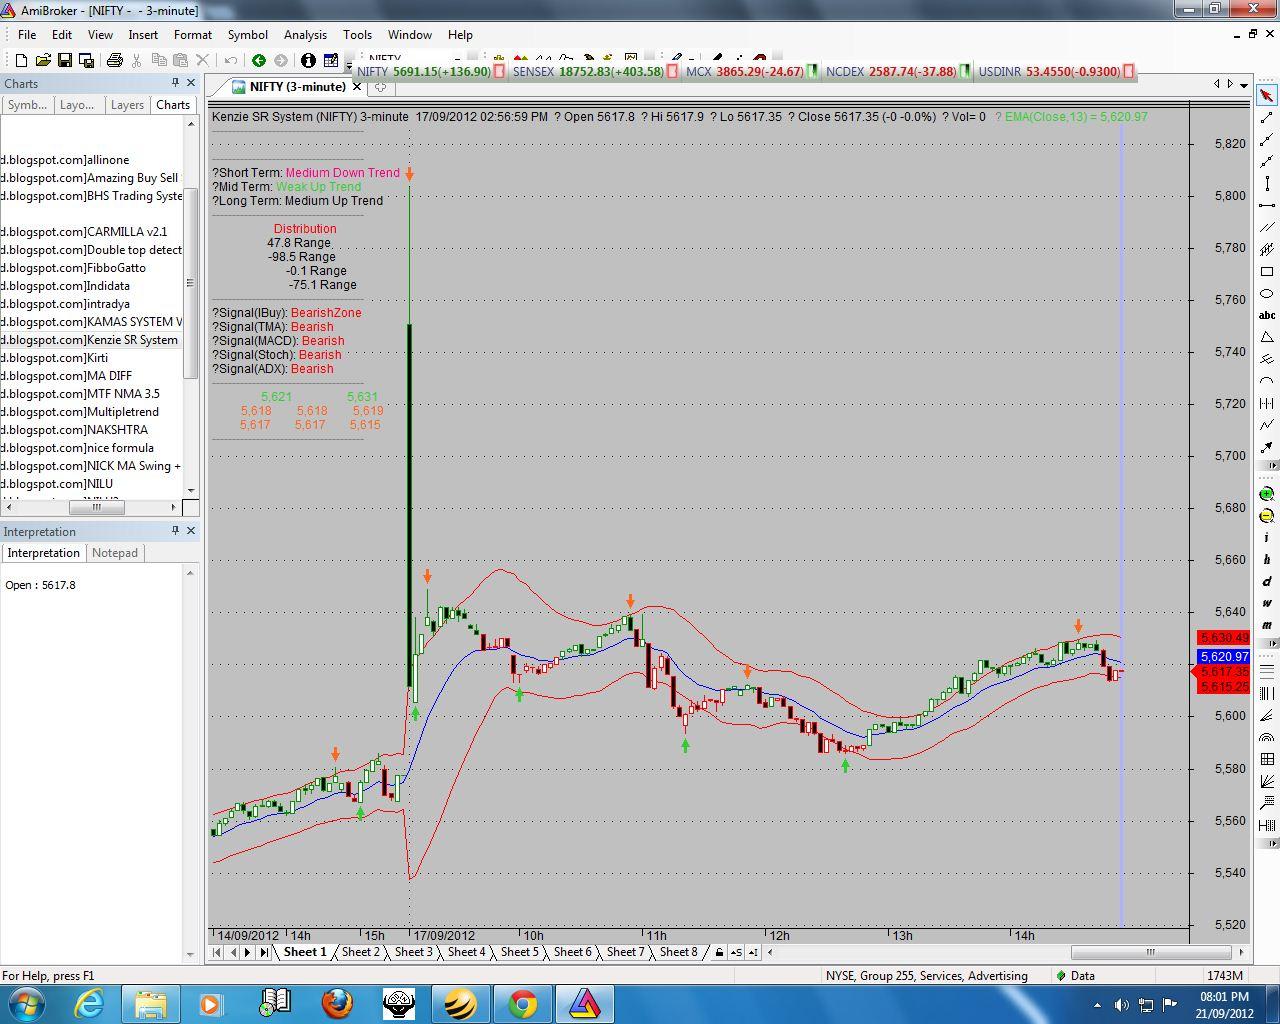 Amibroker trading systems